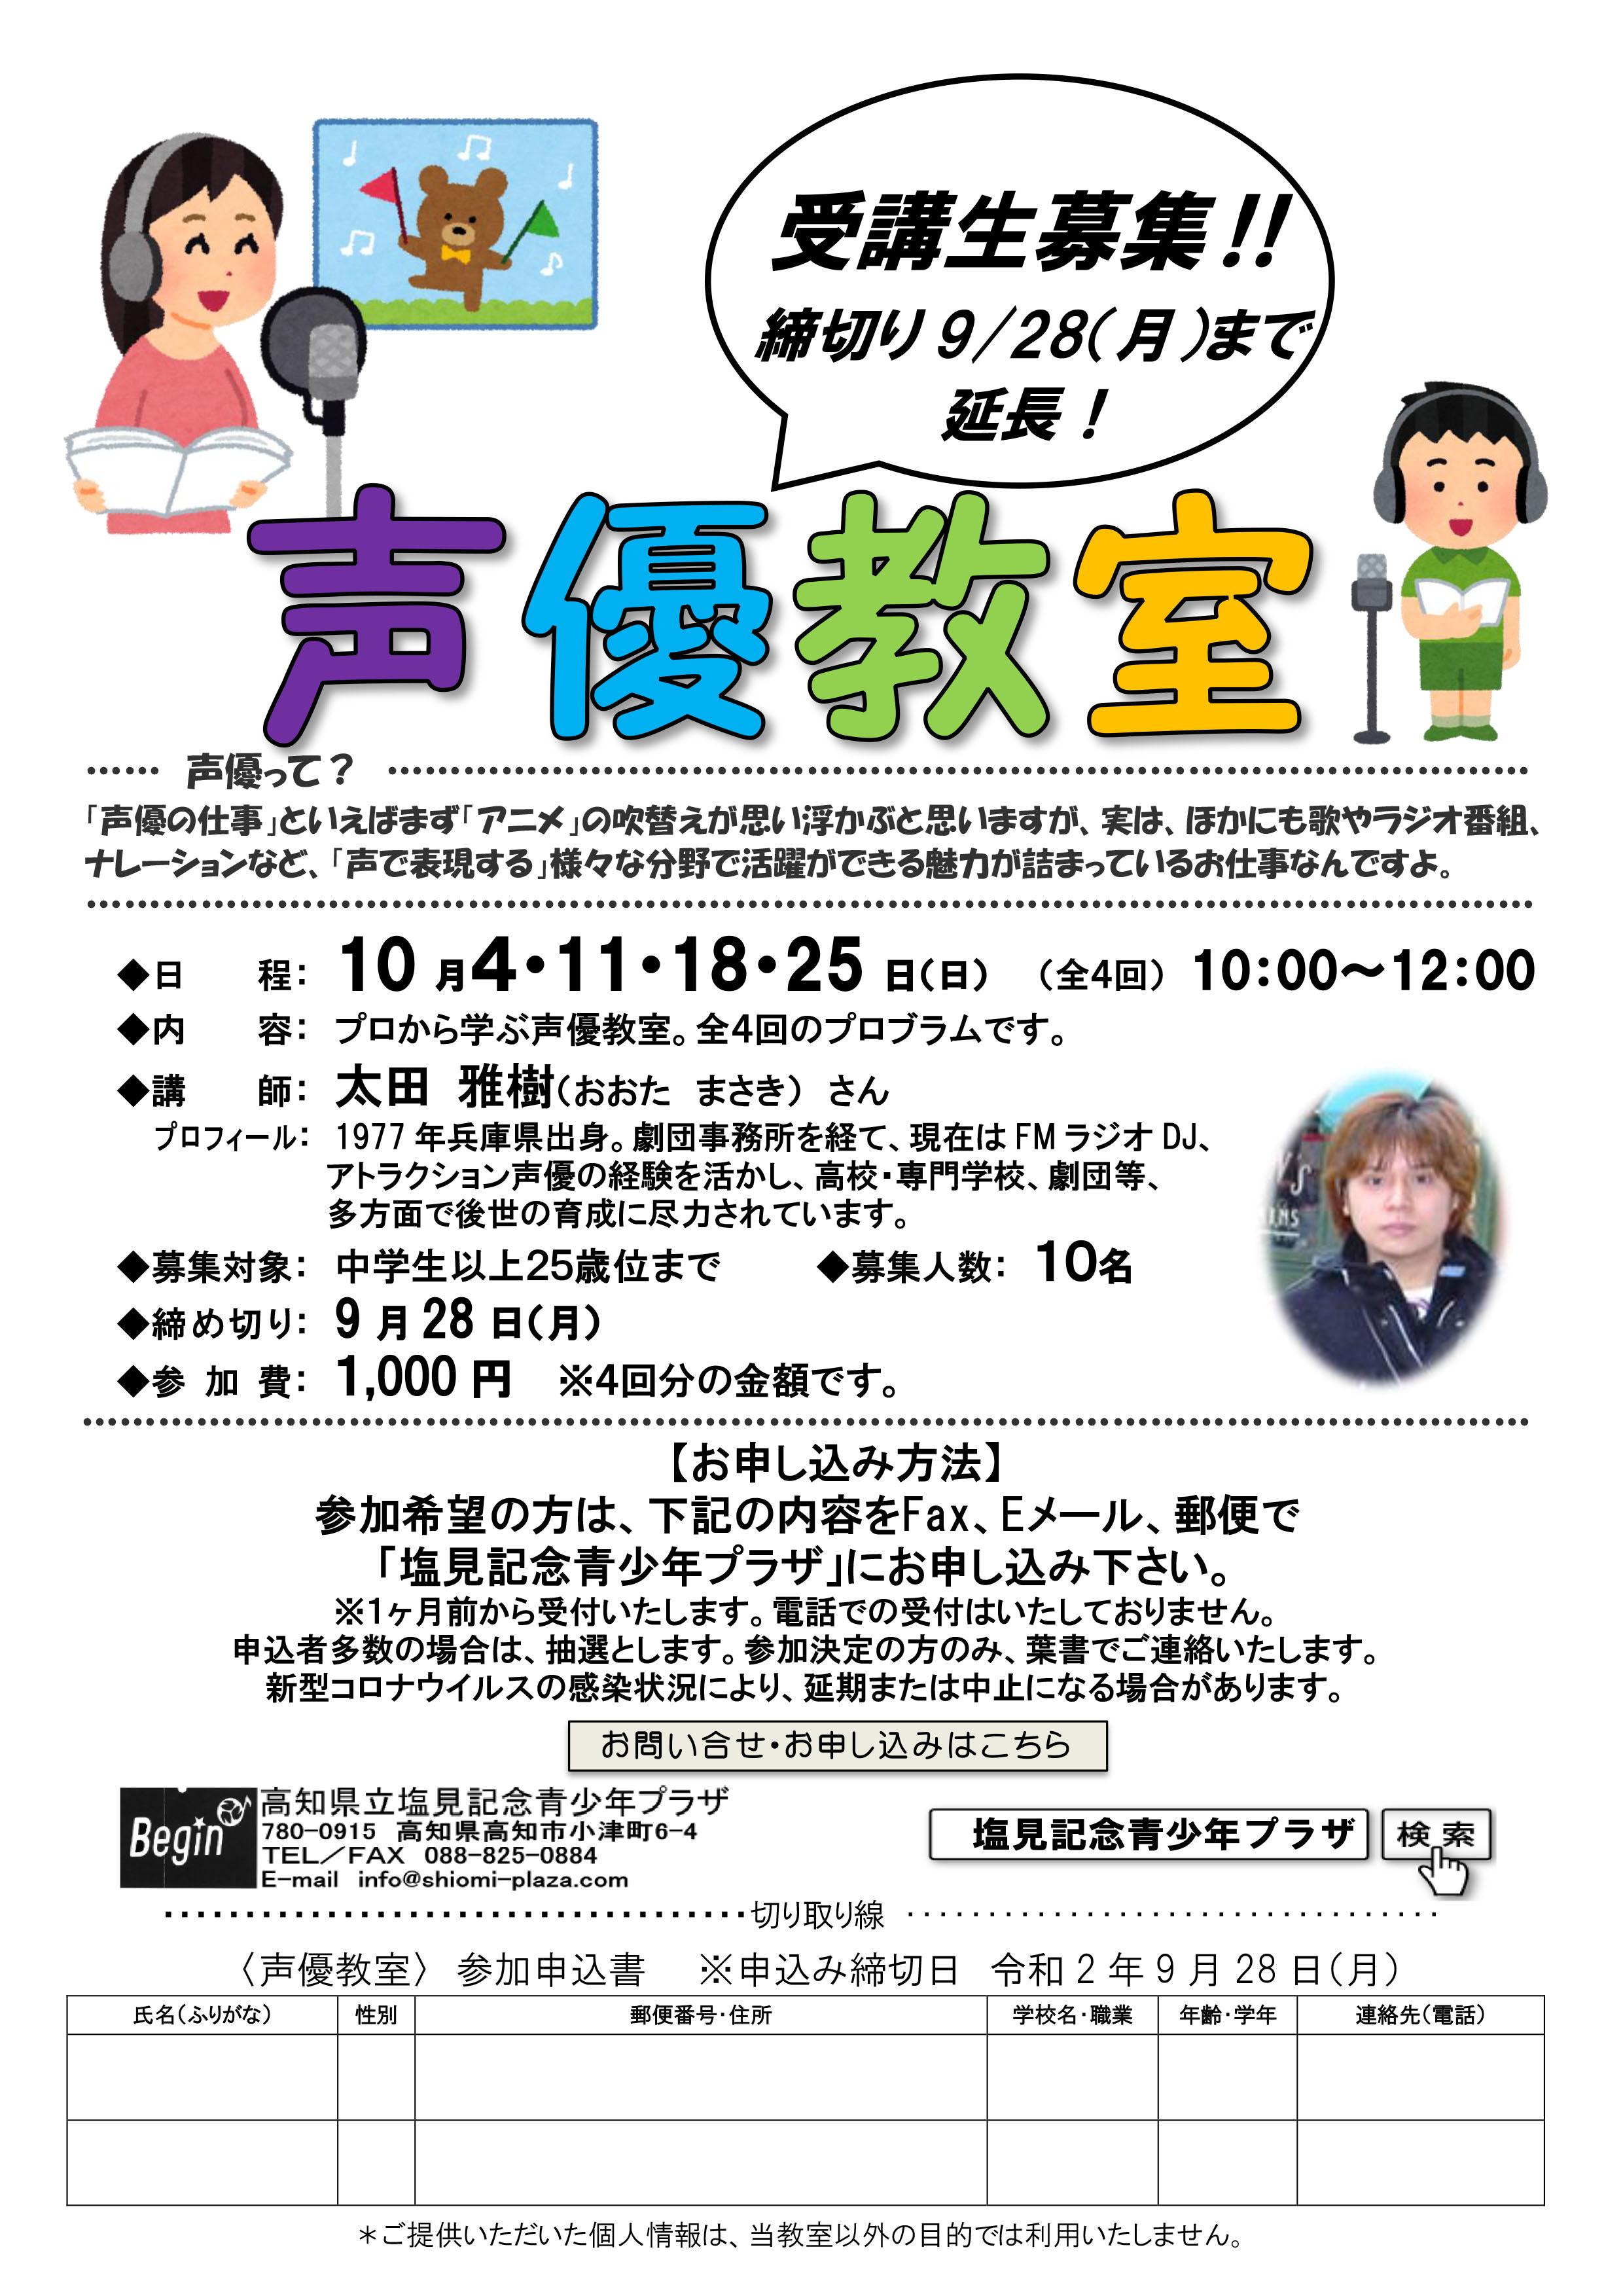 2020.10.04seiyu-entyo.jpg